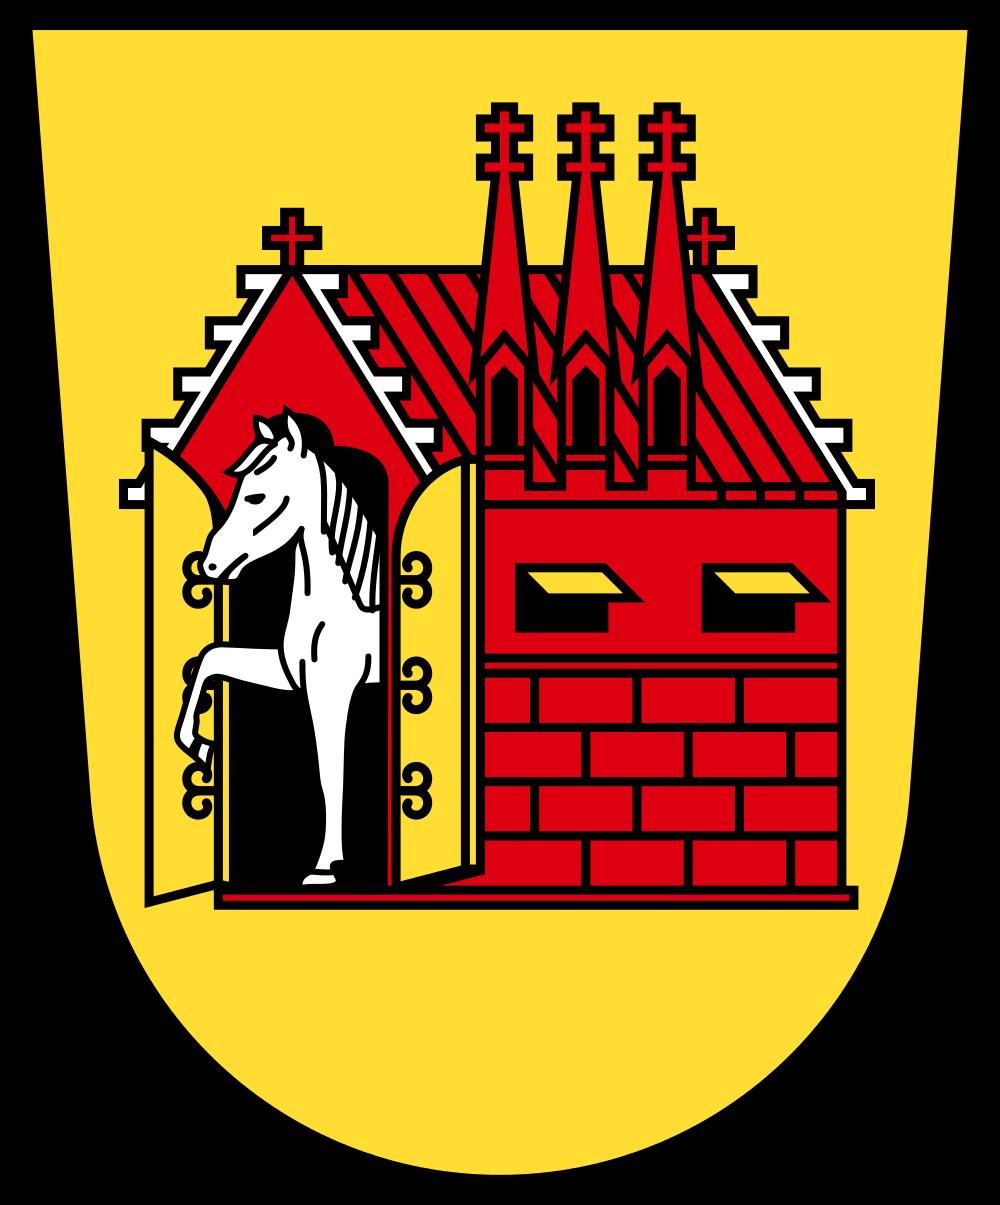 File:Wappen von Roßtal3.svg.